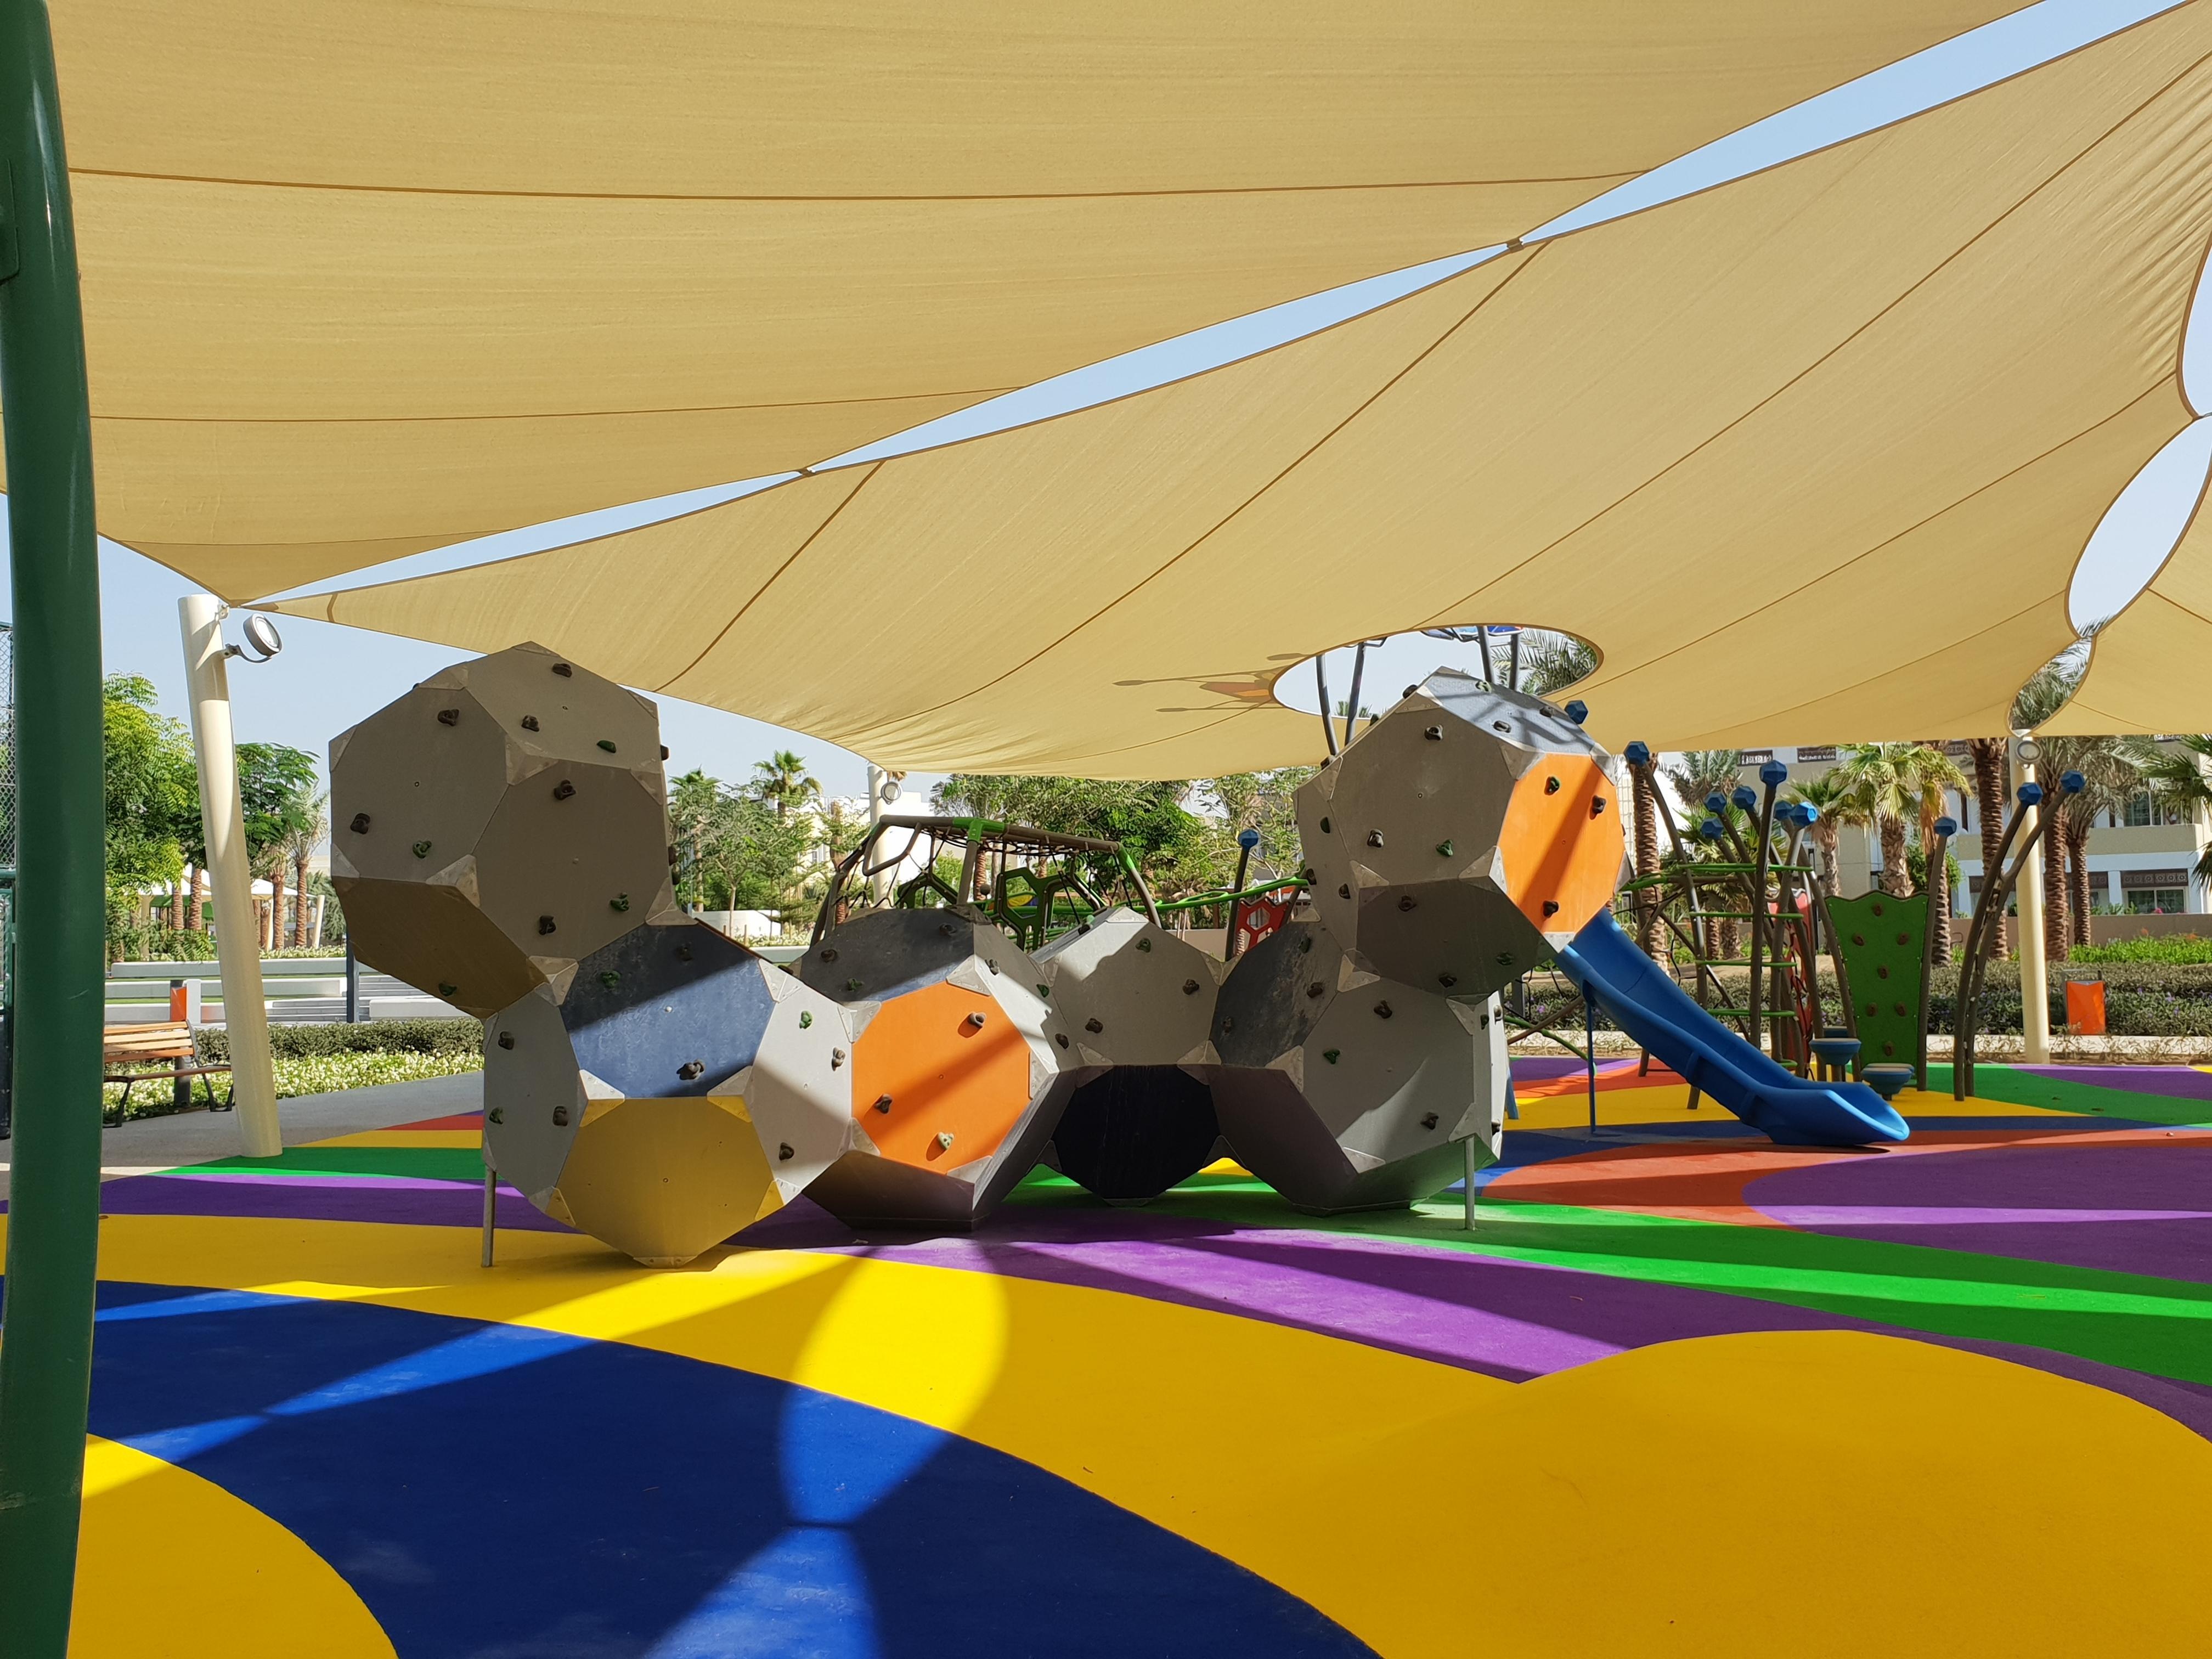 #kidsplayarea #5to15agegroup #Mutong #Centralpark #playgroundequipments #communitypark #landscaping #dubaiproperties #dubaiholdings